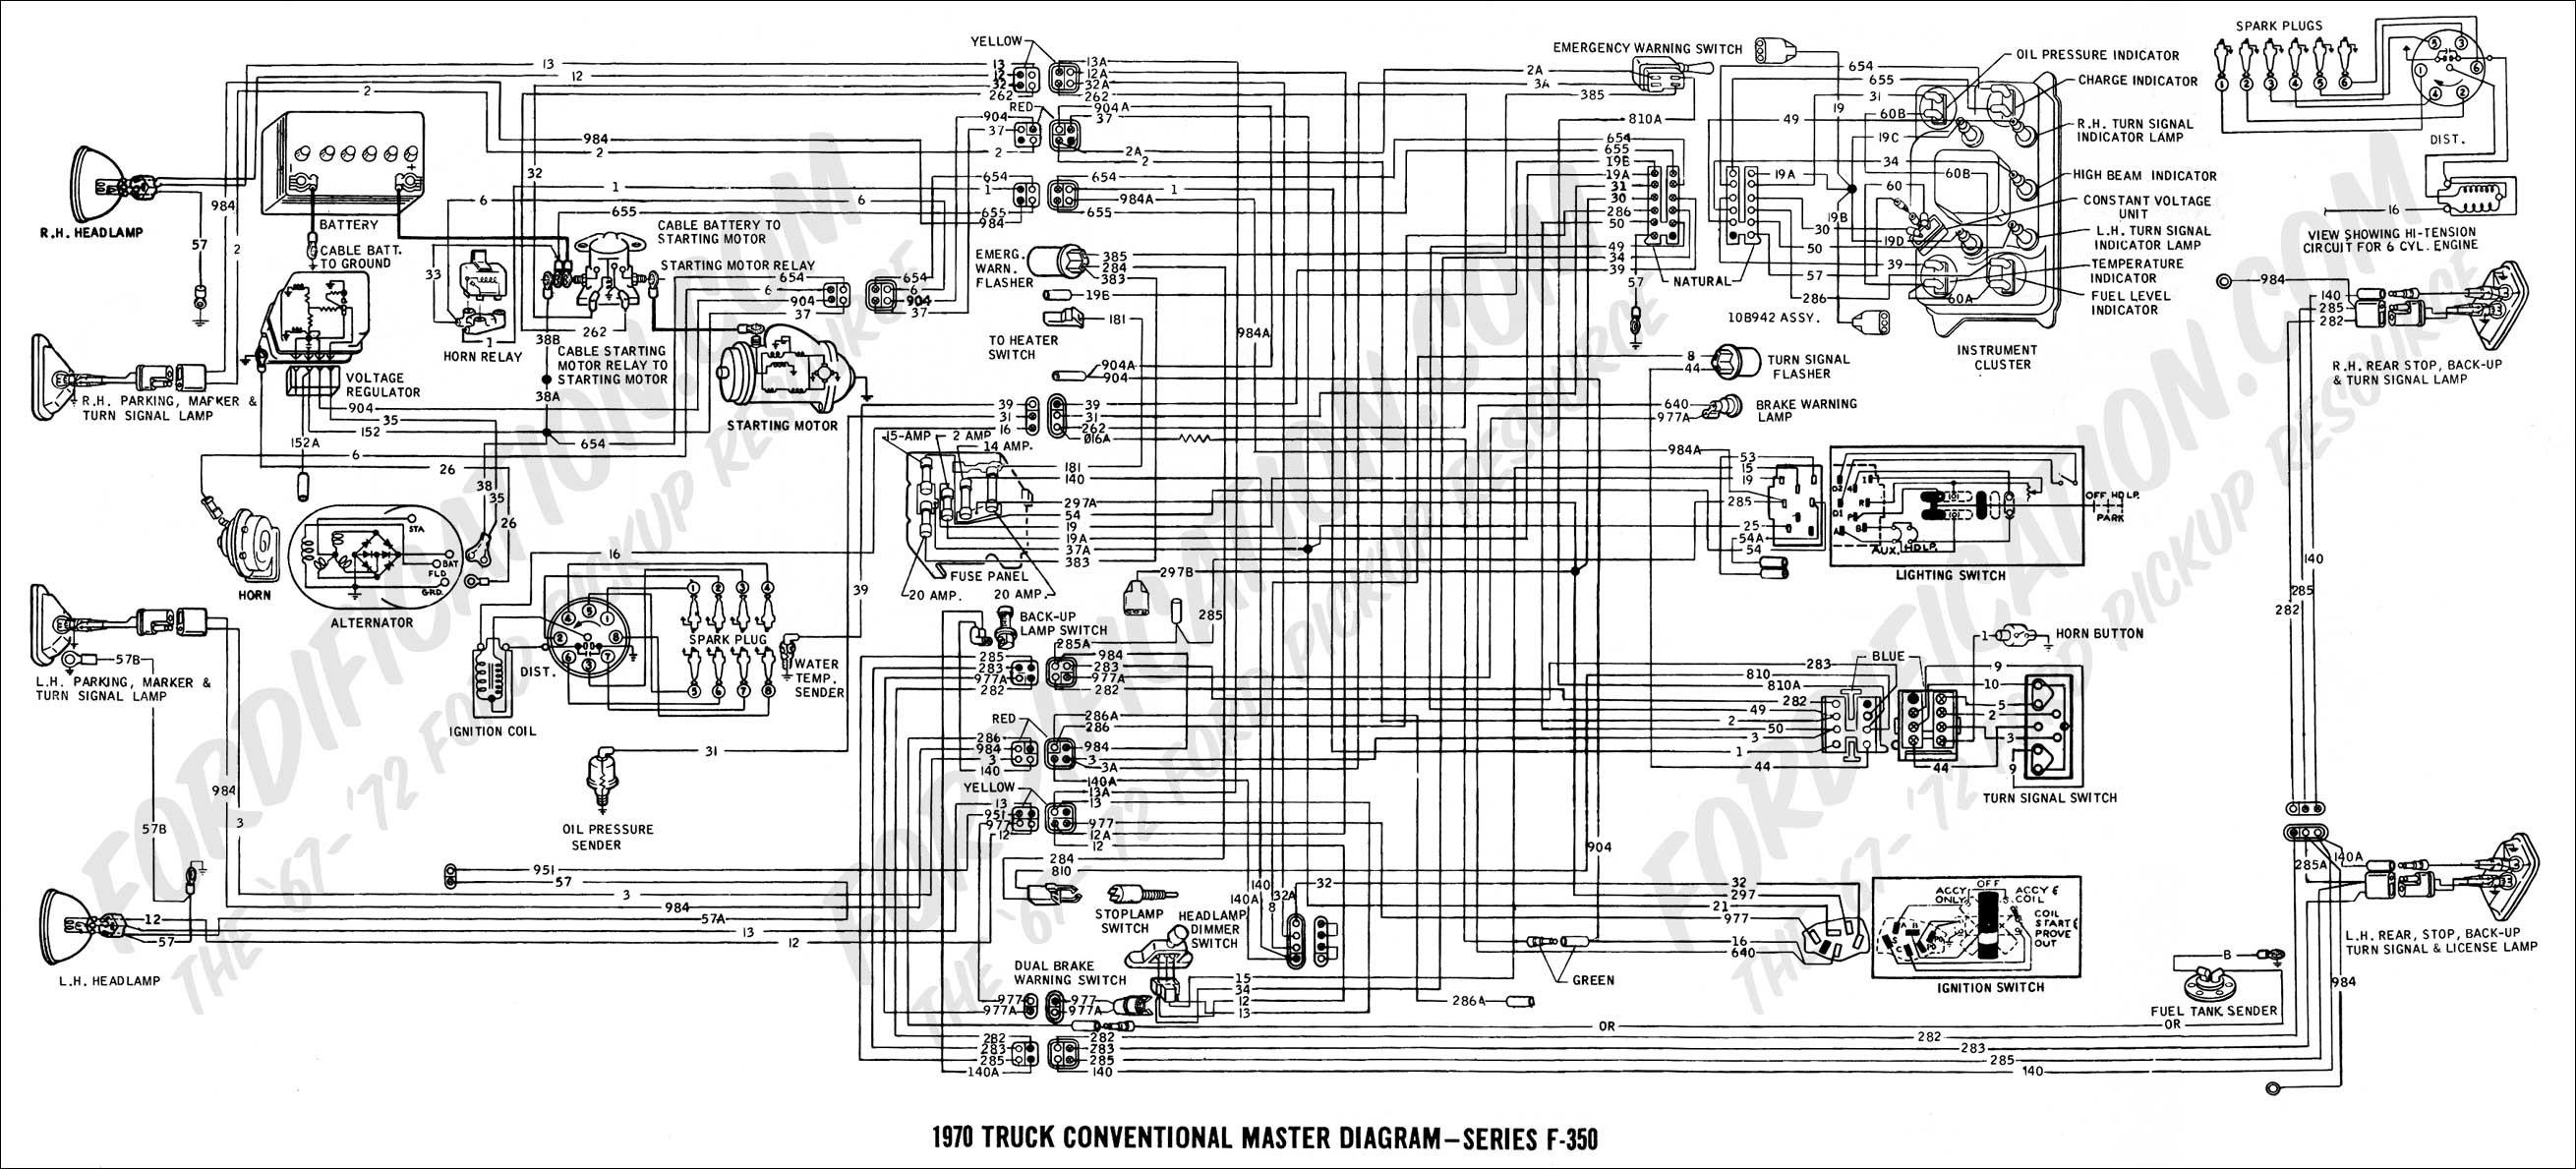 Kit Car Wiring Diagram Engine Kawasaki Zxi Basic As Well Ford F 350 In Addition Headlight